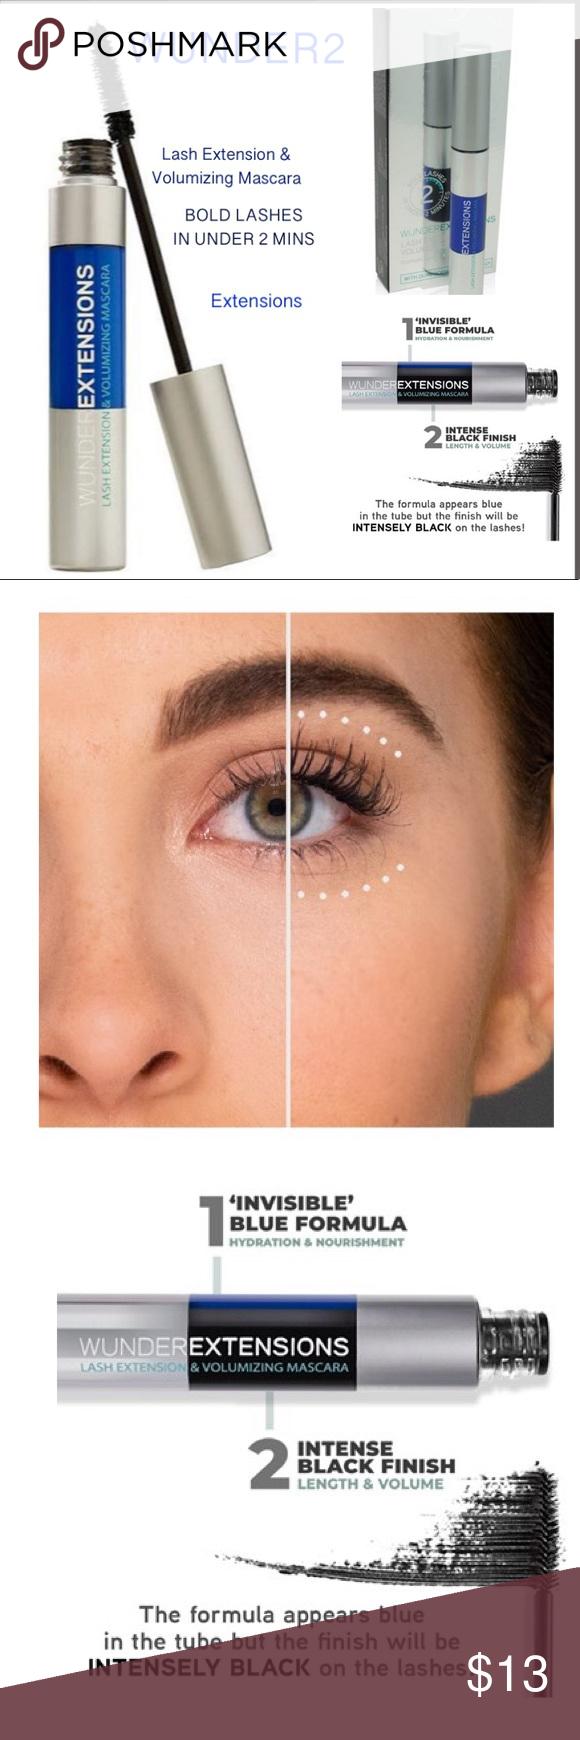 284c68675e1 WUNDER2 Lash Extension & Volumizing Mascara New Authentic Mascara combines  two formulas in the same tube